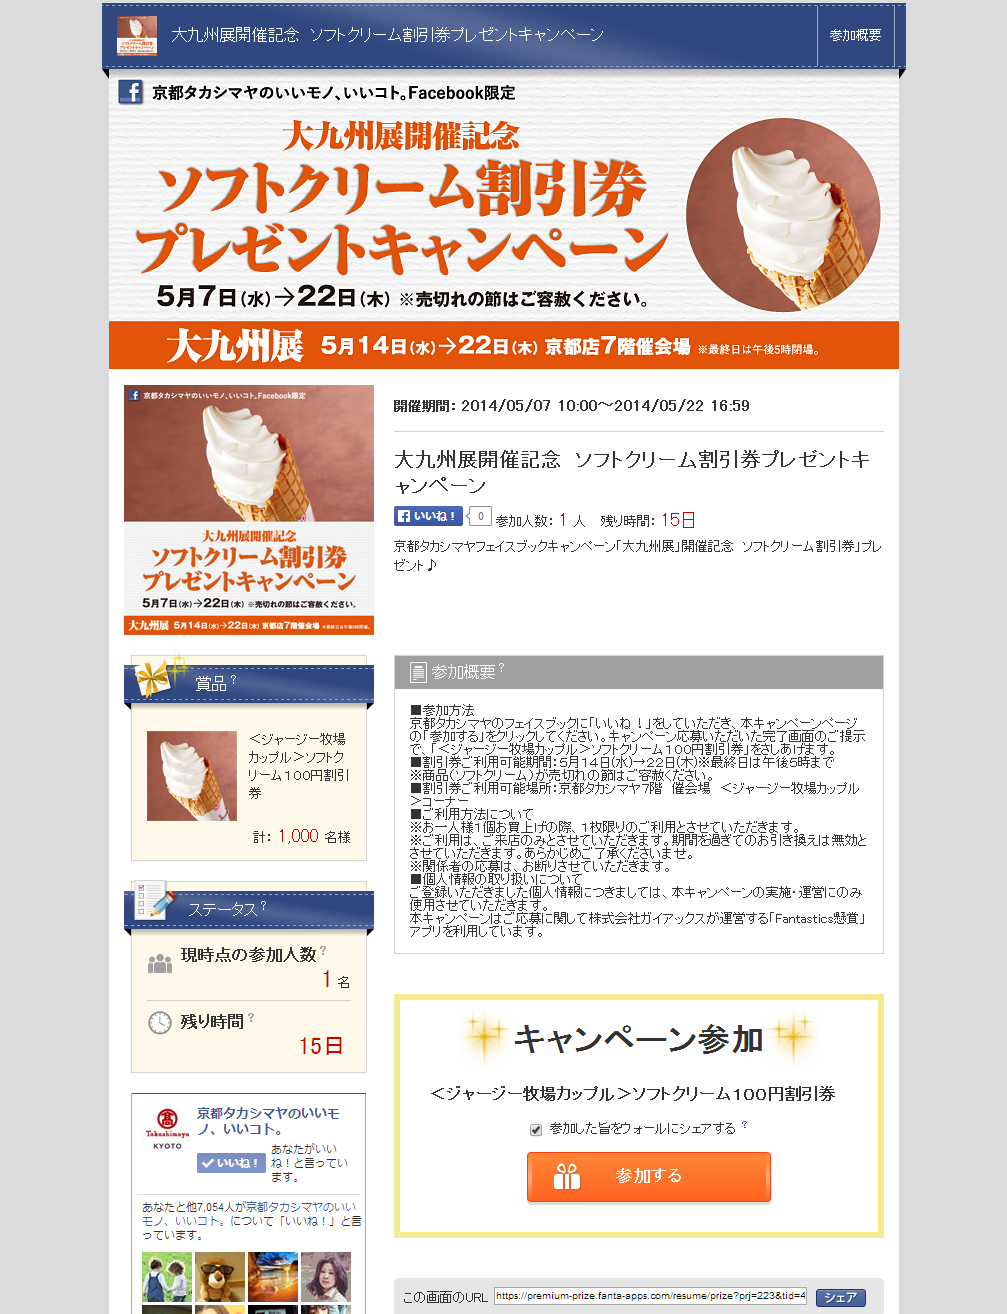 Fantastics「アンケート型」懸賞アプリ(株式会社高島屋様)